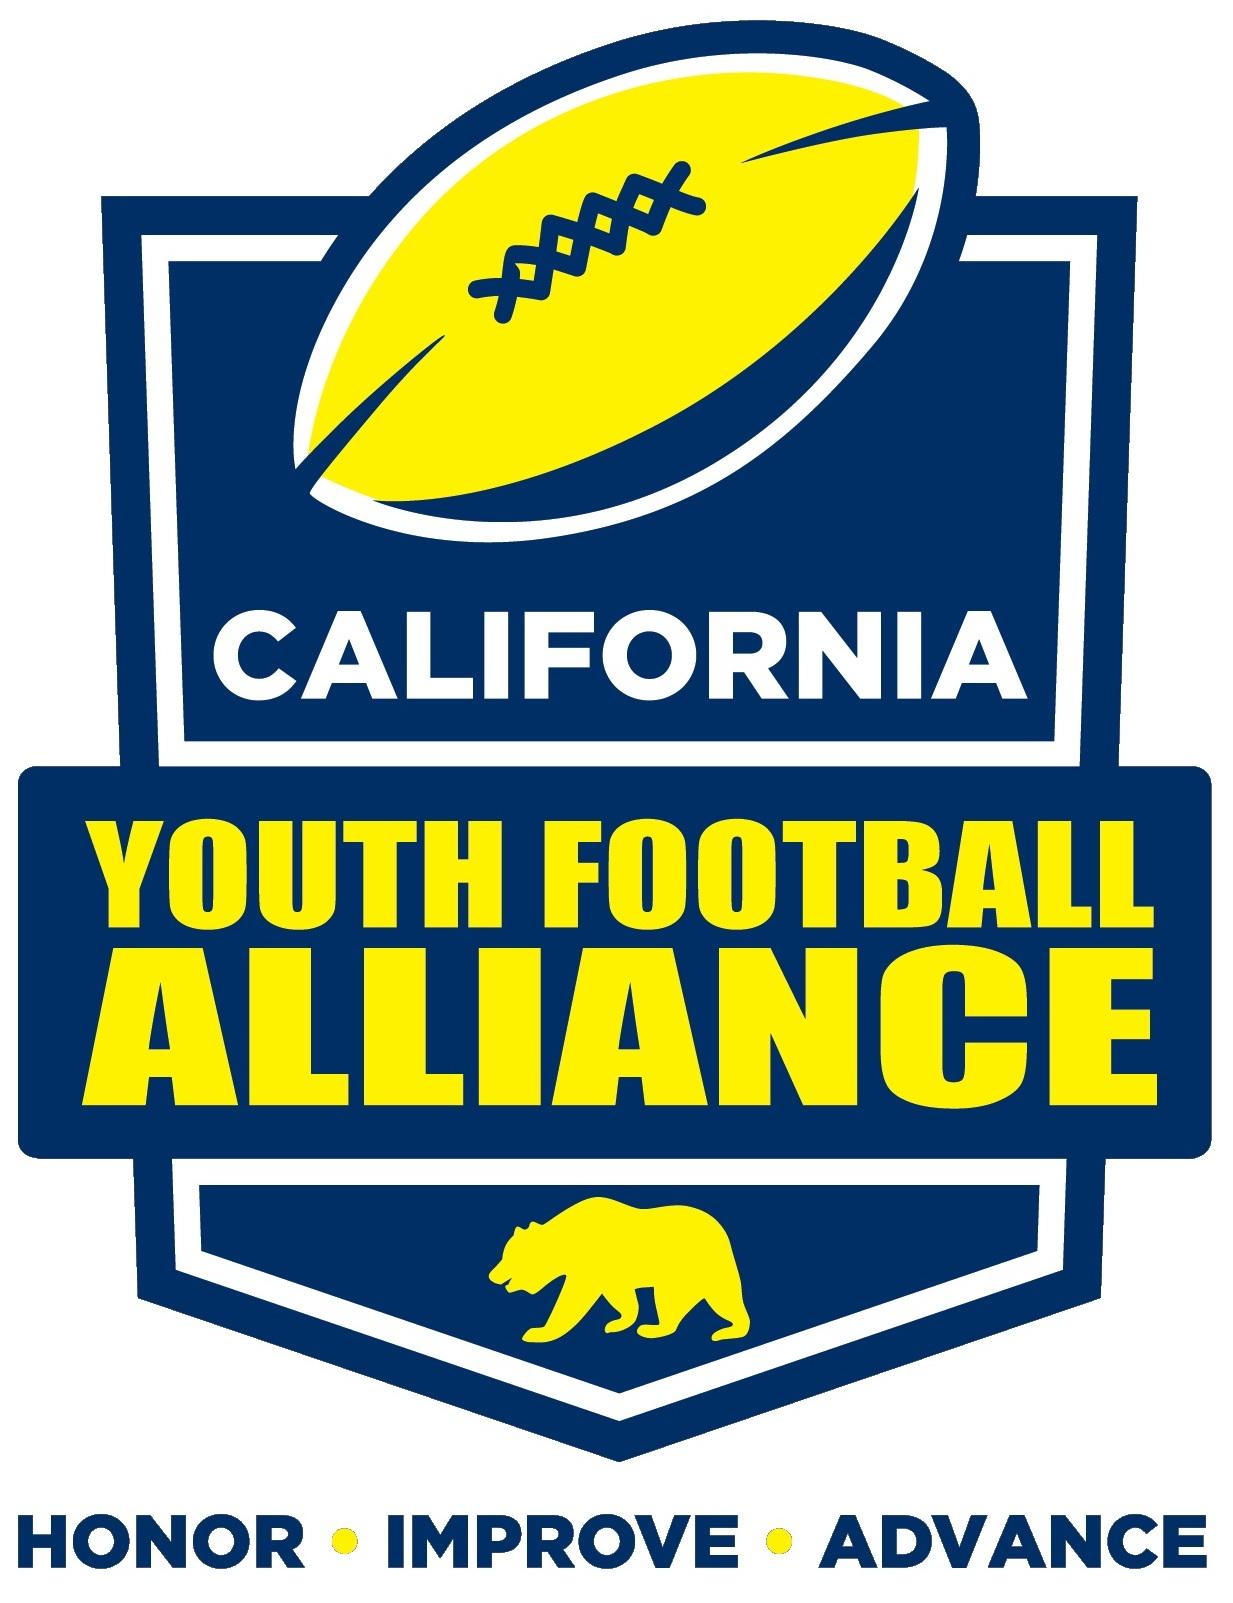 Board — California Youth Football Alliance